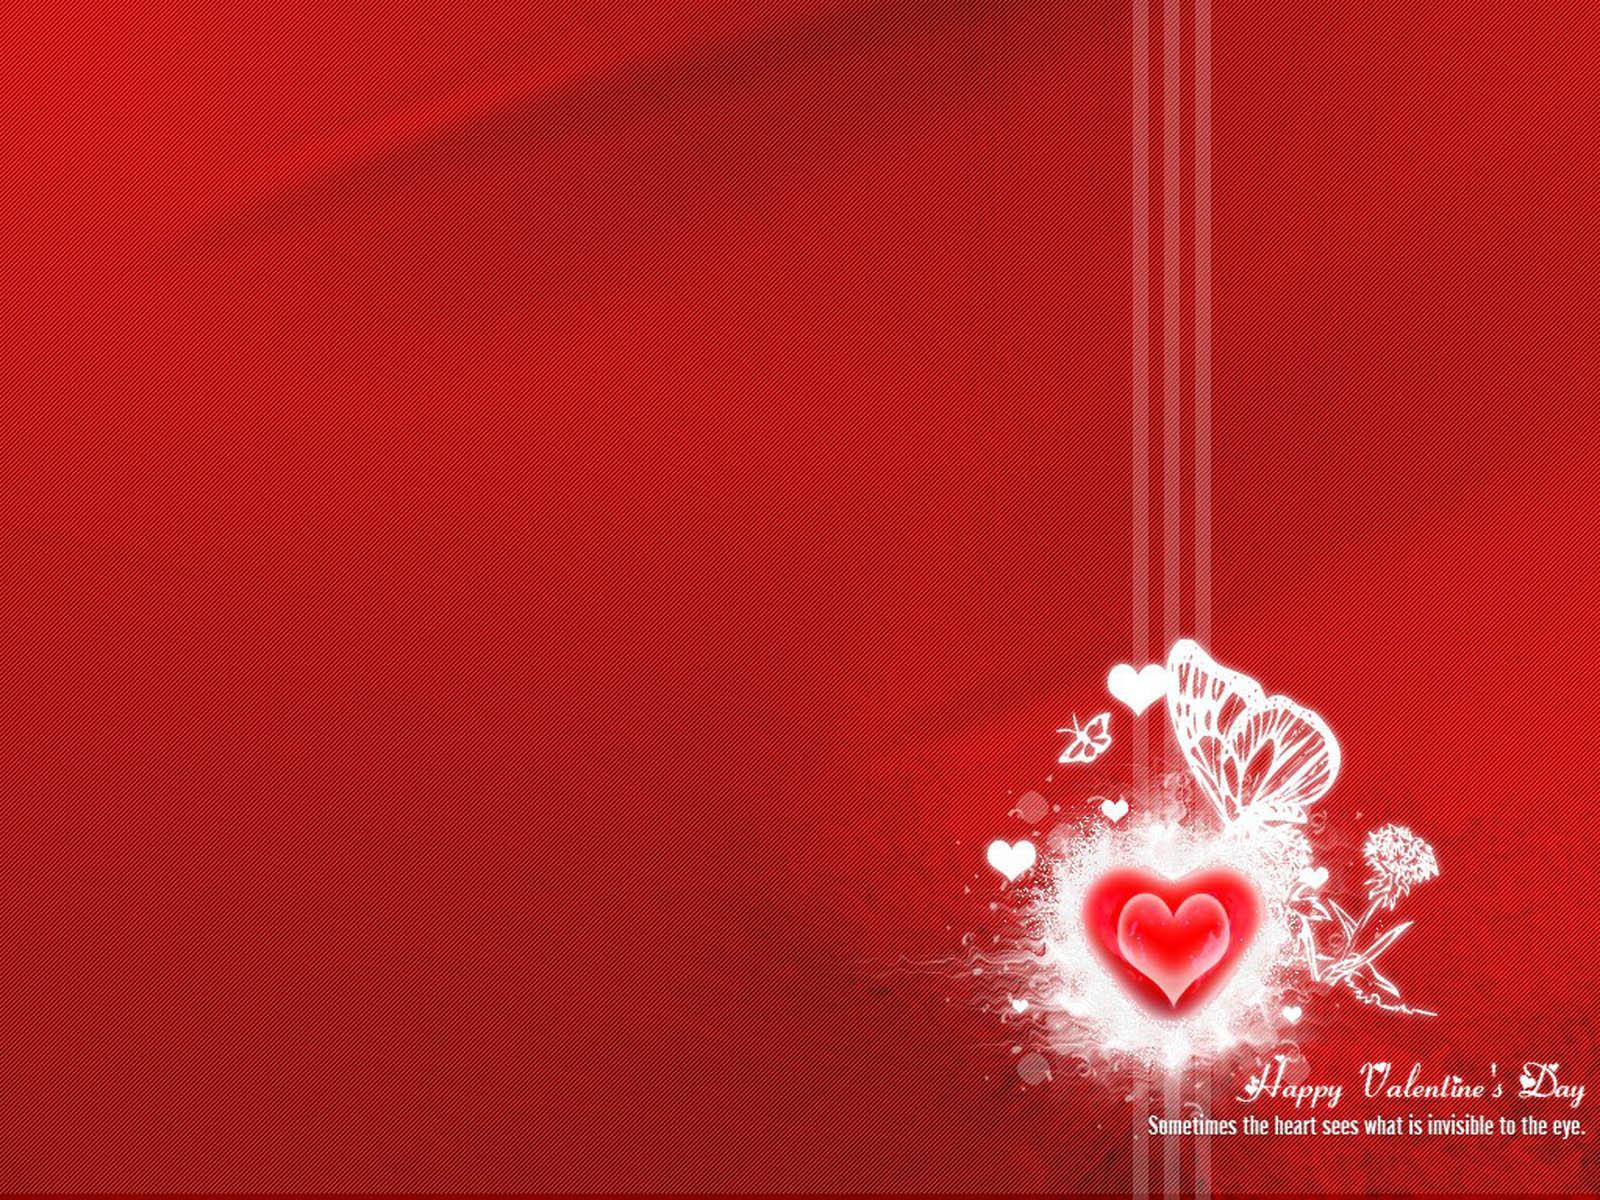 valentines day background wallpaper -#main